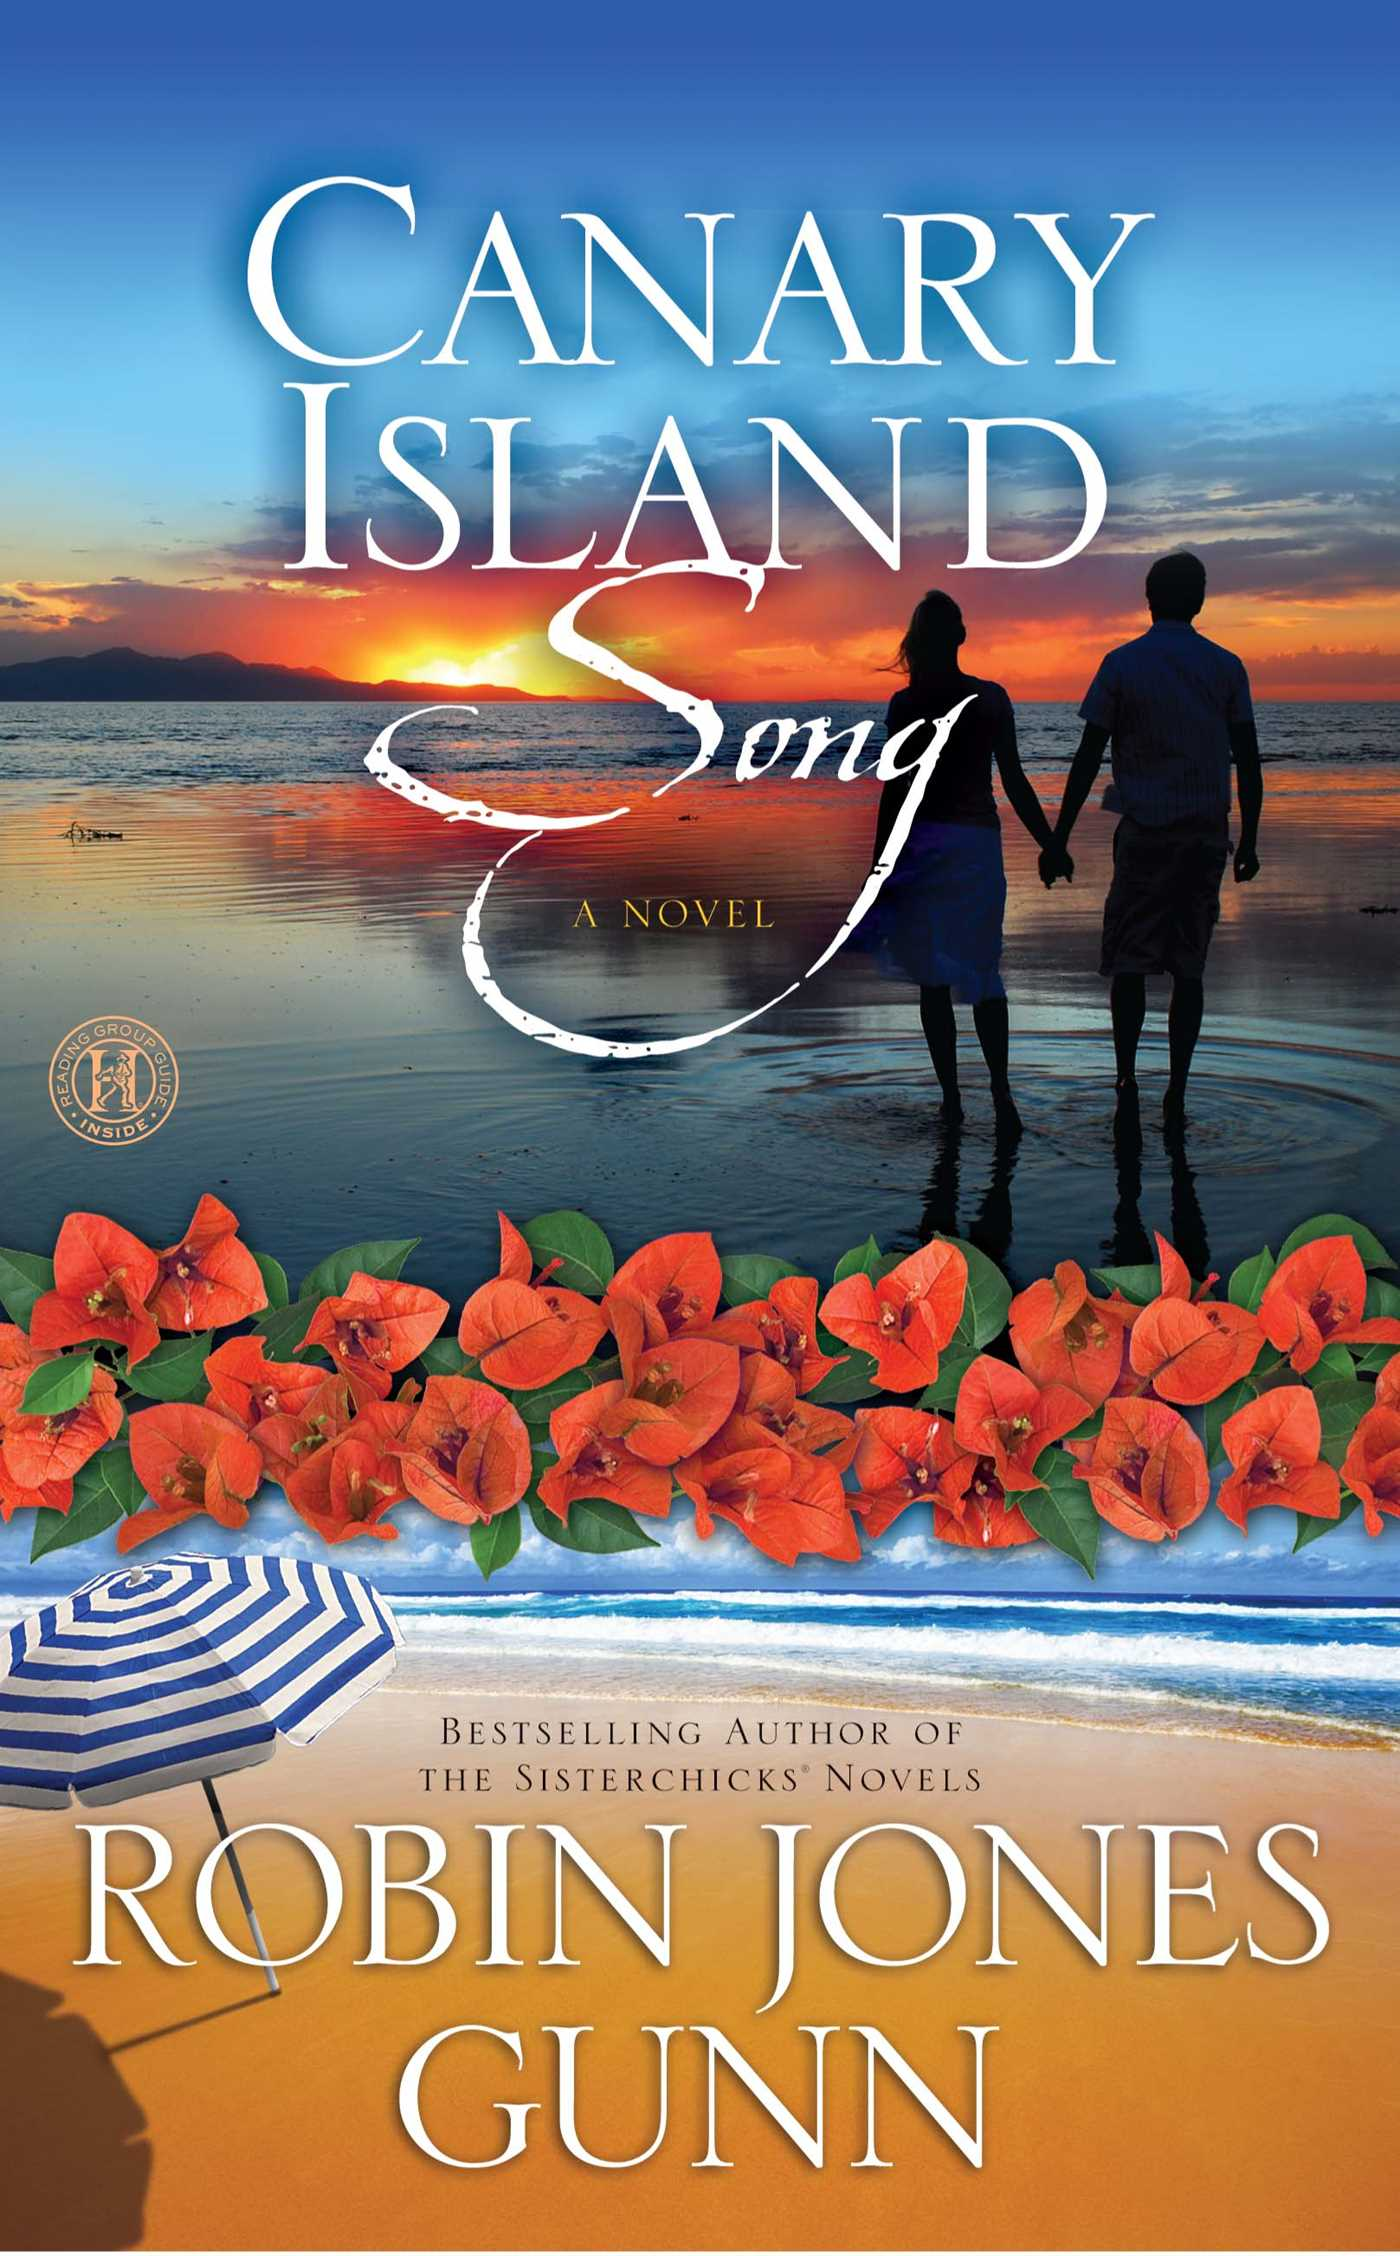 Canary island song 9781416583417 hr